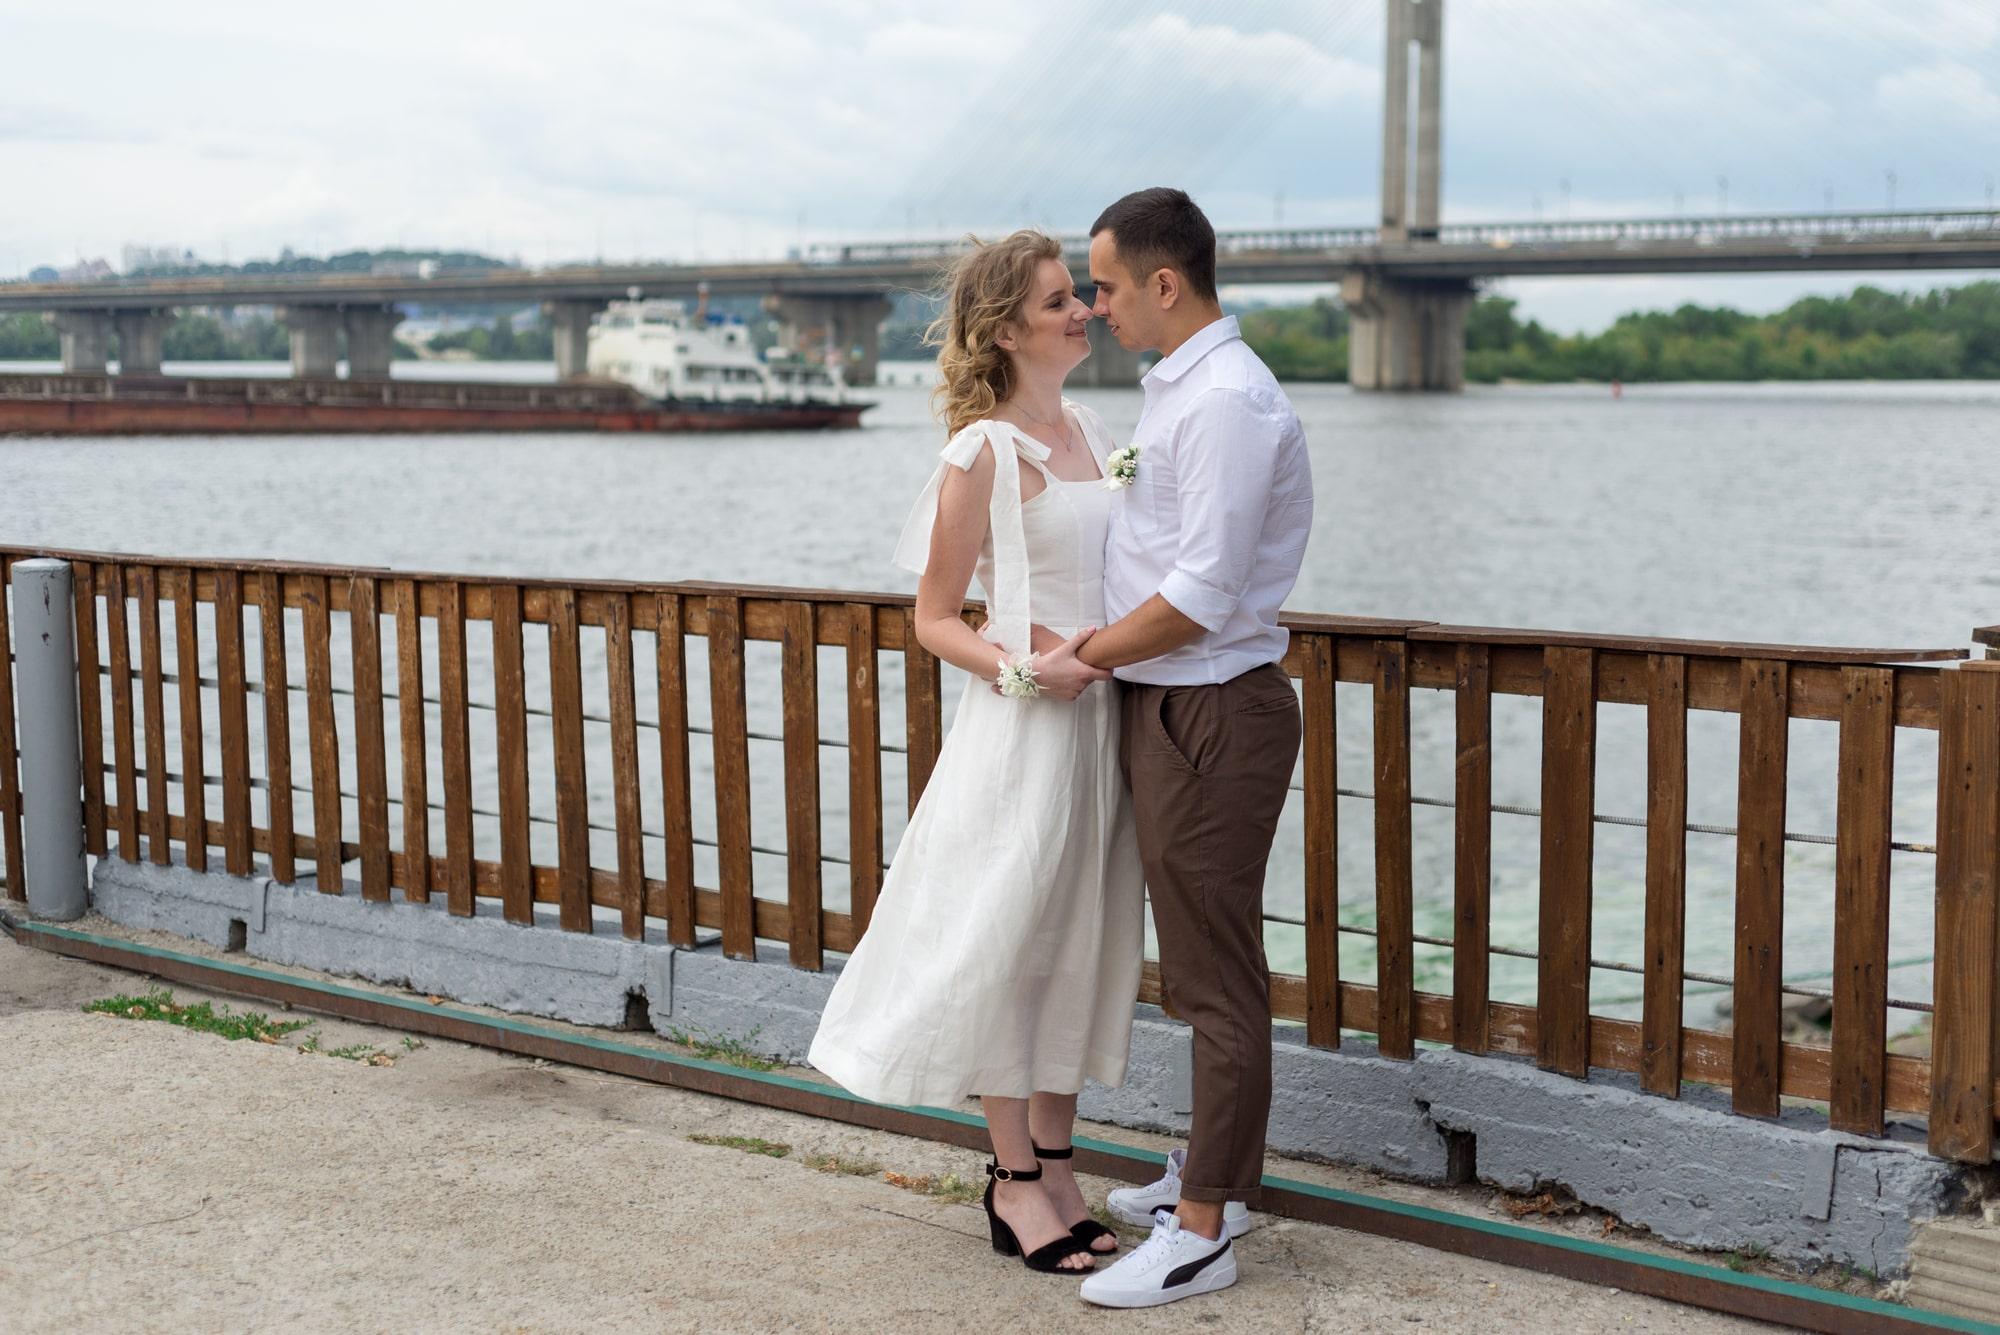 Фотосессия свадебная возле Днепра - танцы возле Днепра